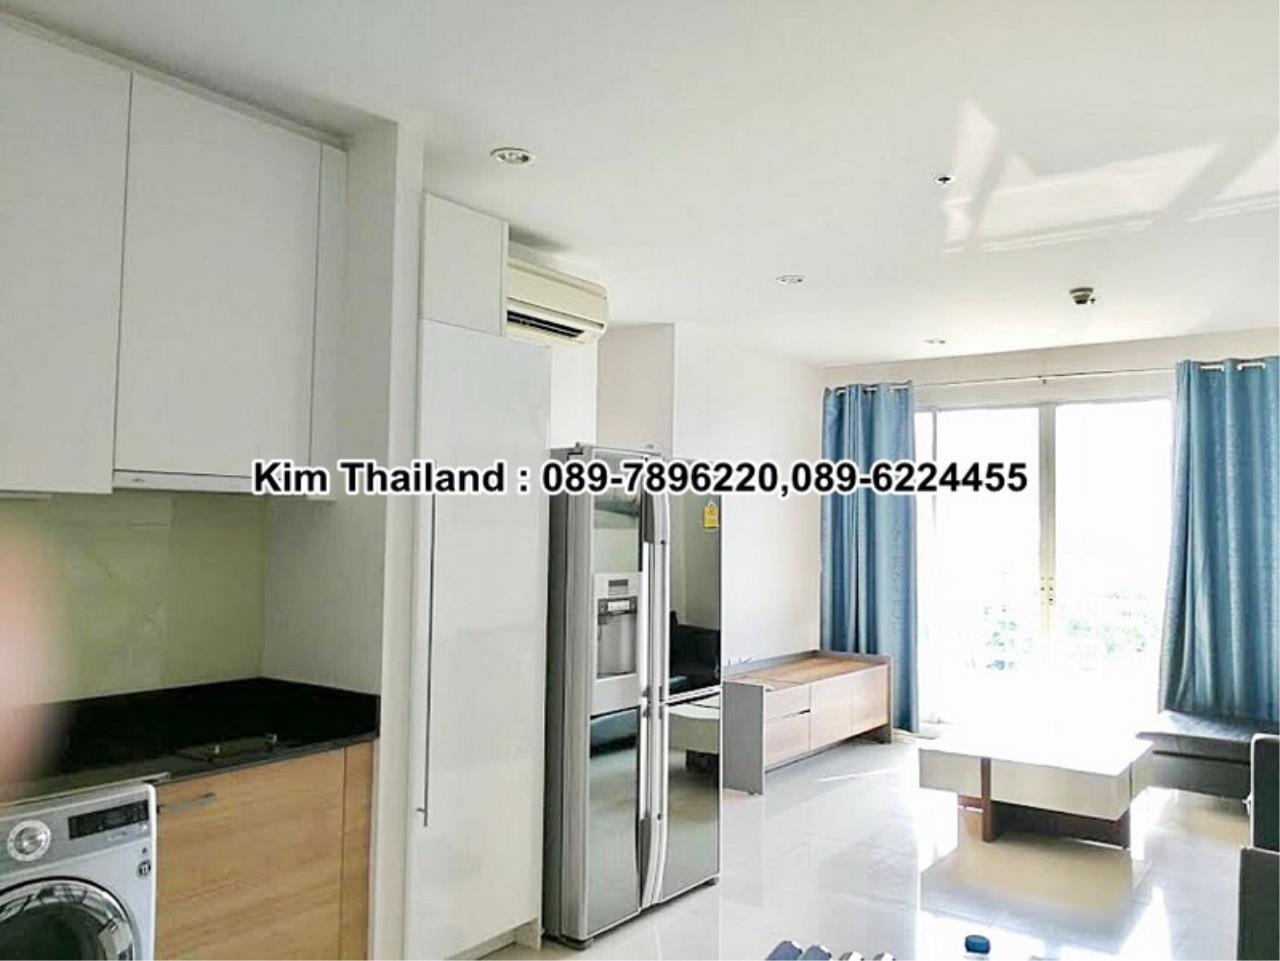 BKKcondorental Agency's For rent, Circle Condominium.  Area 76 sq.m. 2 bedrooms. Rental 35000THB/month. 3